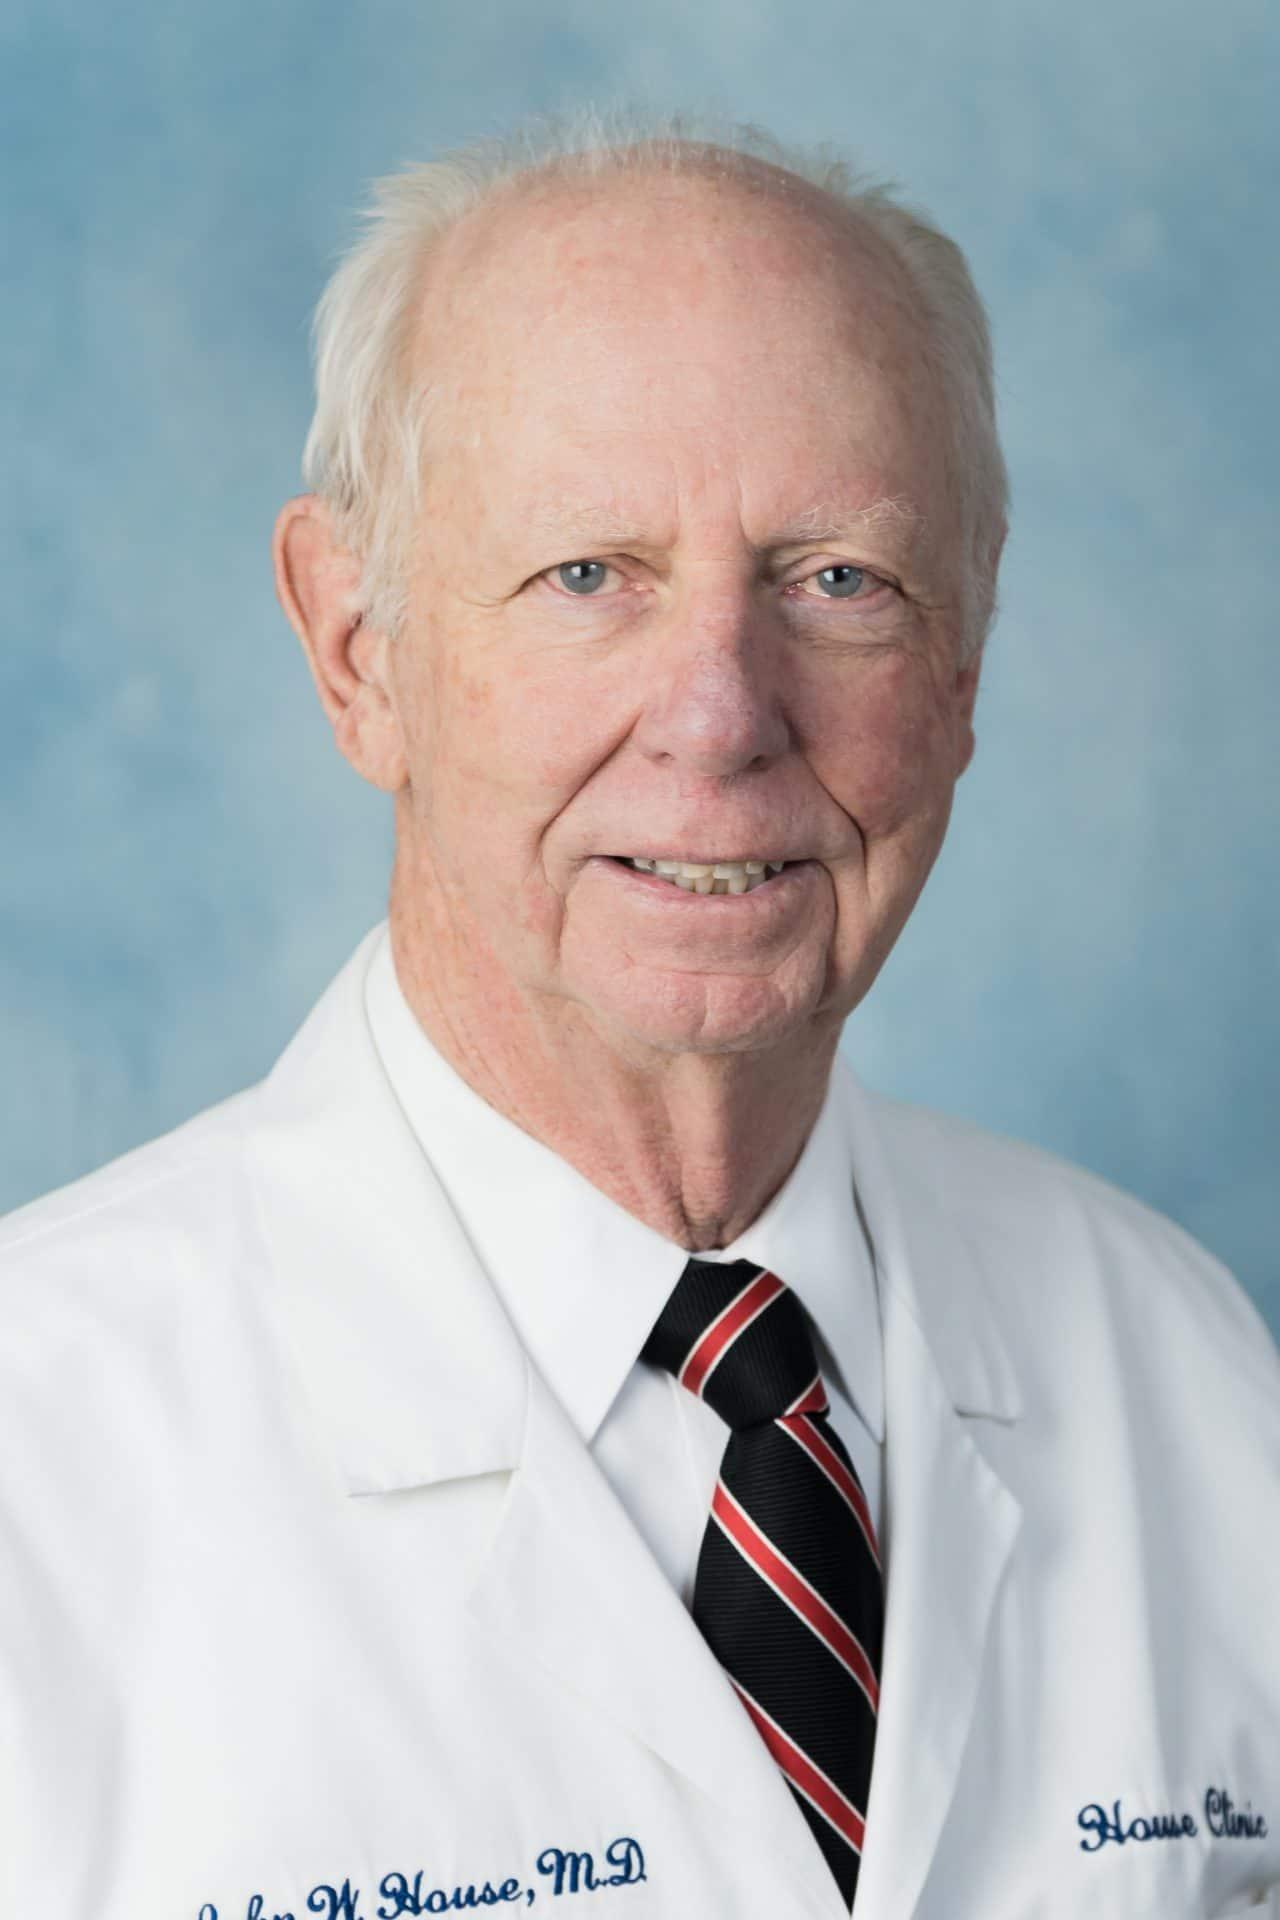 John W. House, MD